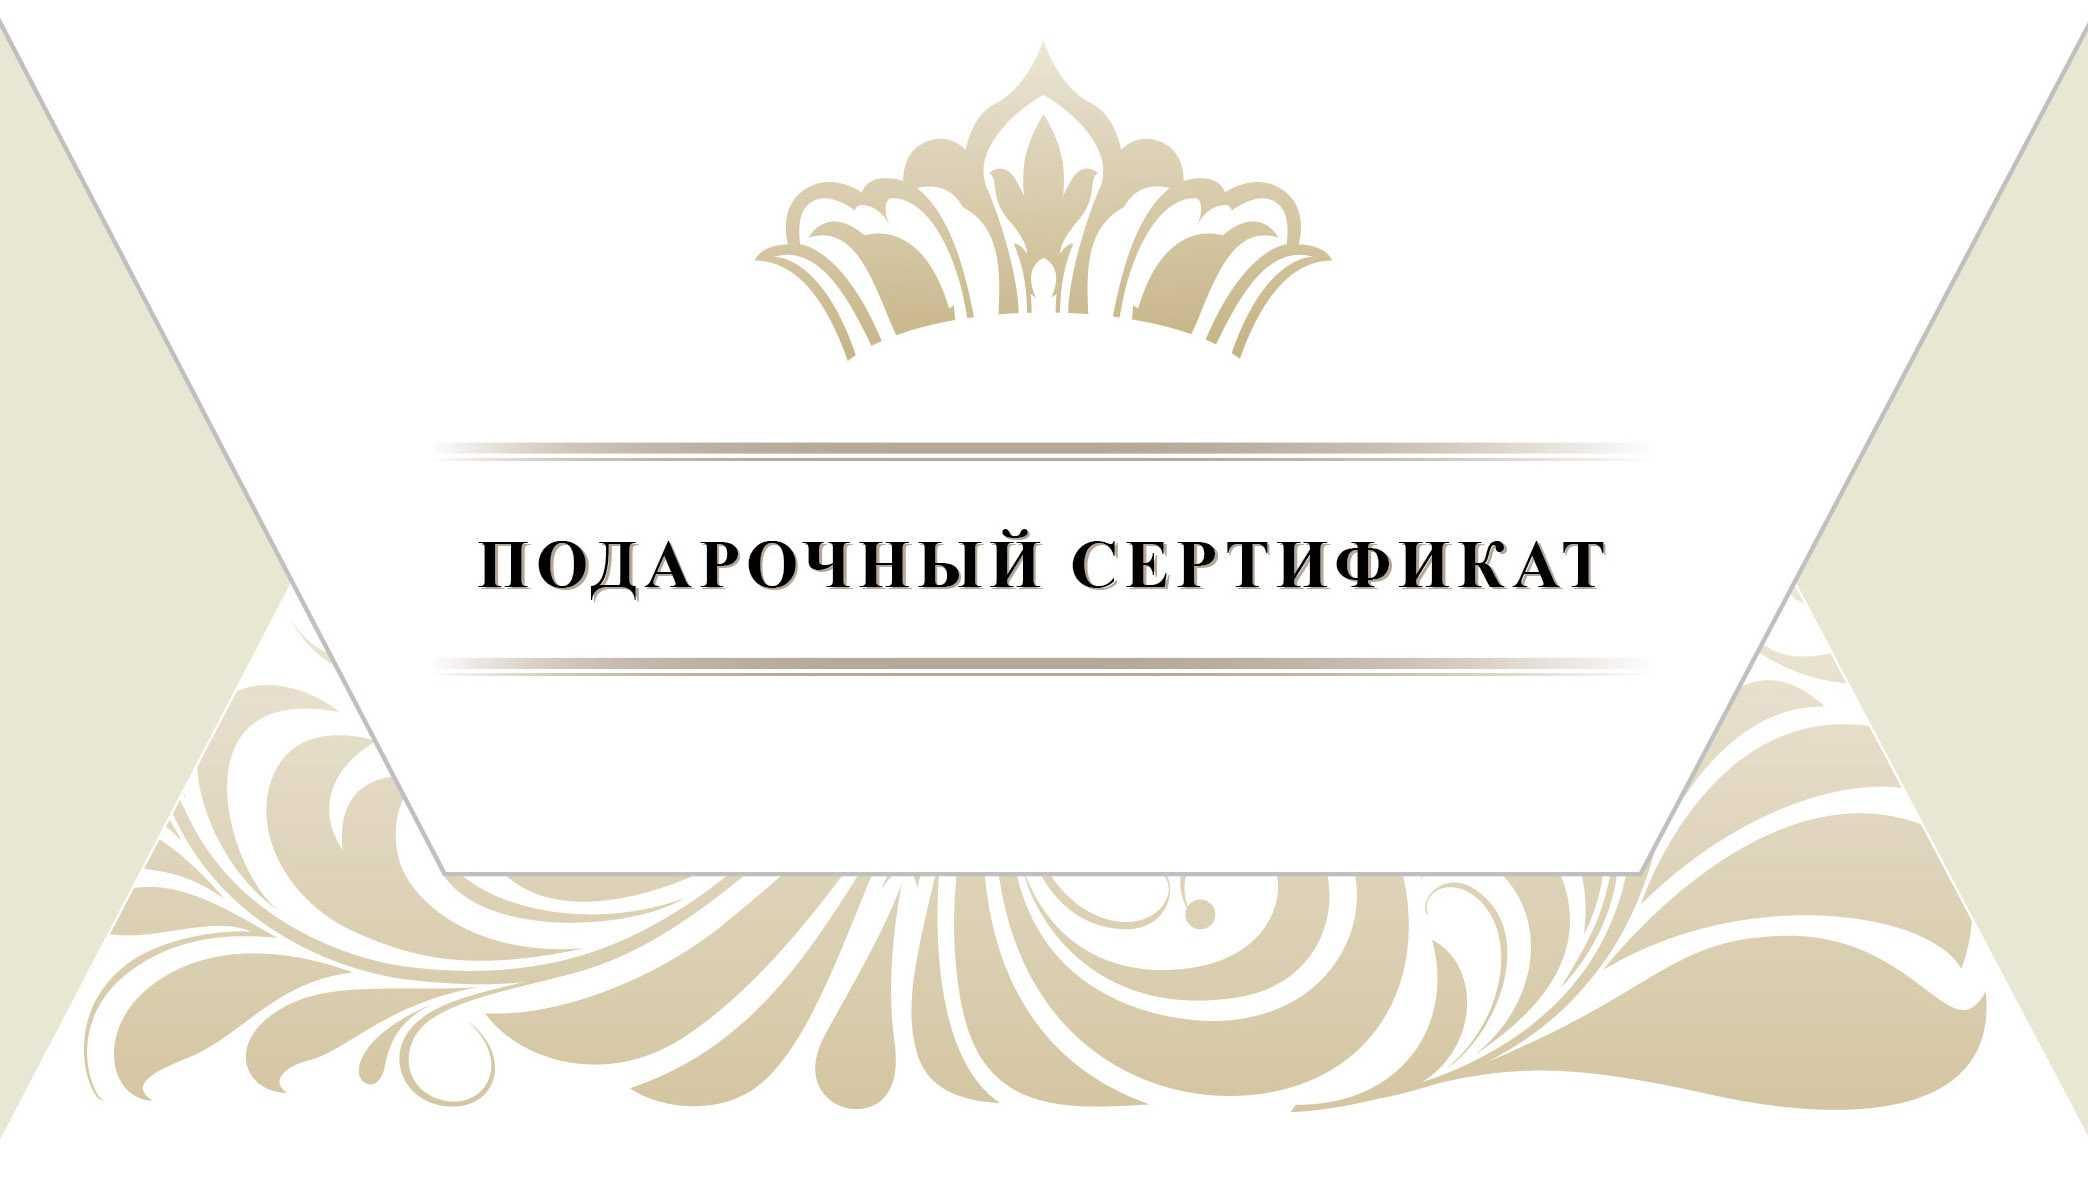 podarochnyi-sertifikat